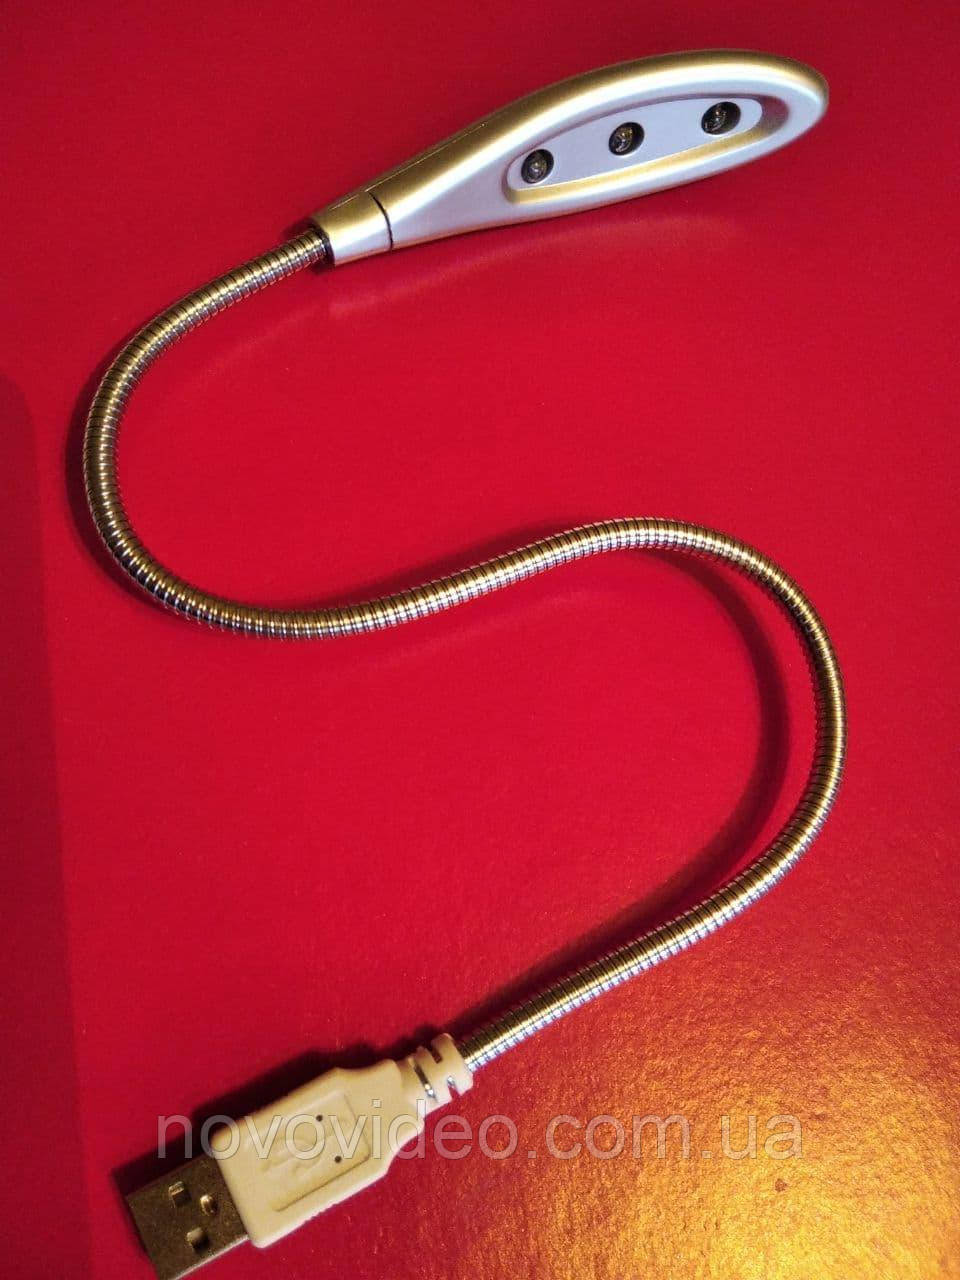 USB-лампа для ноутбука гибкая